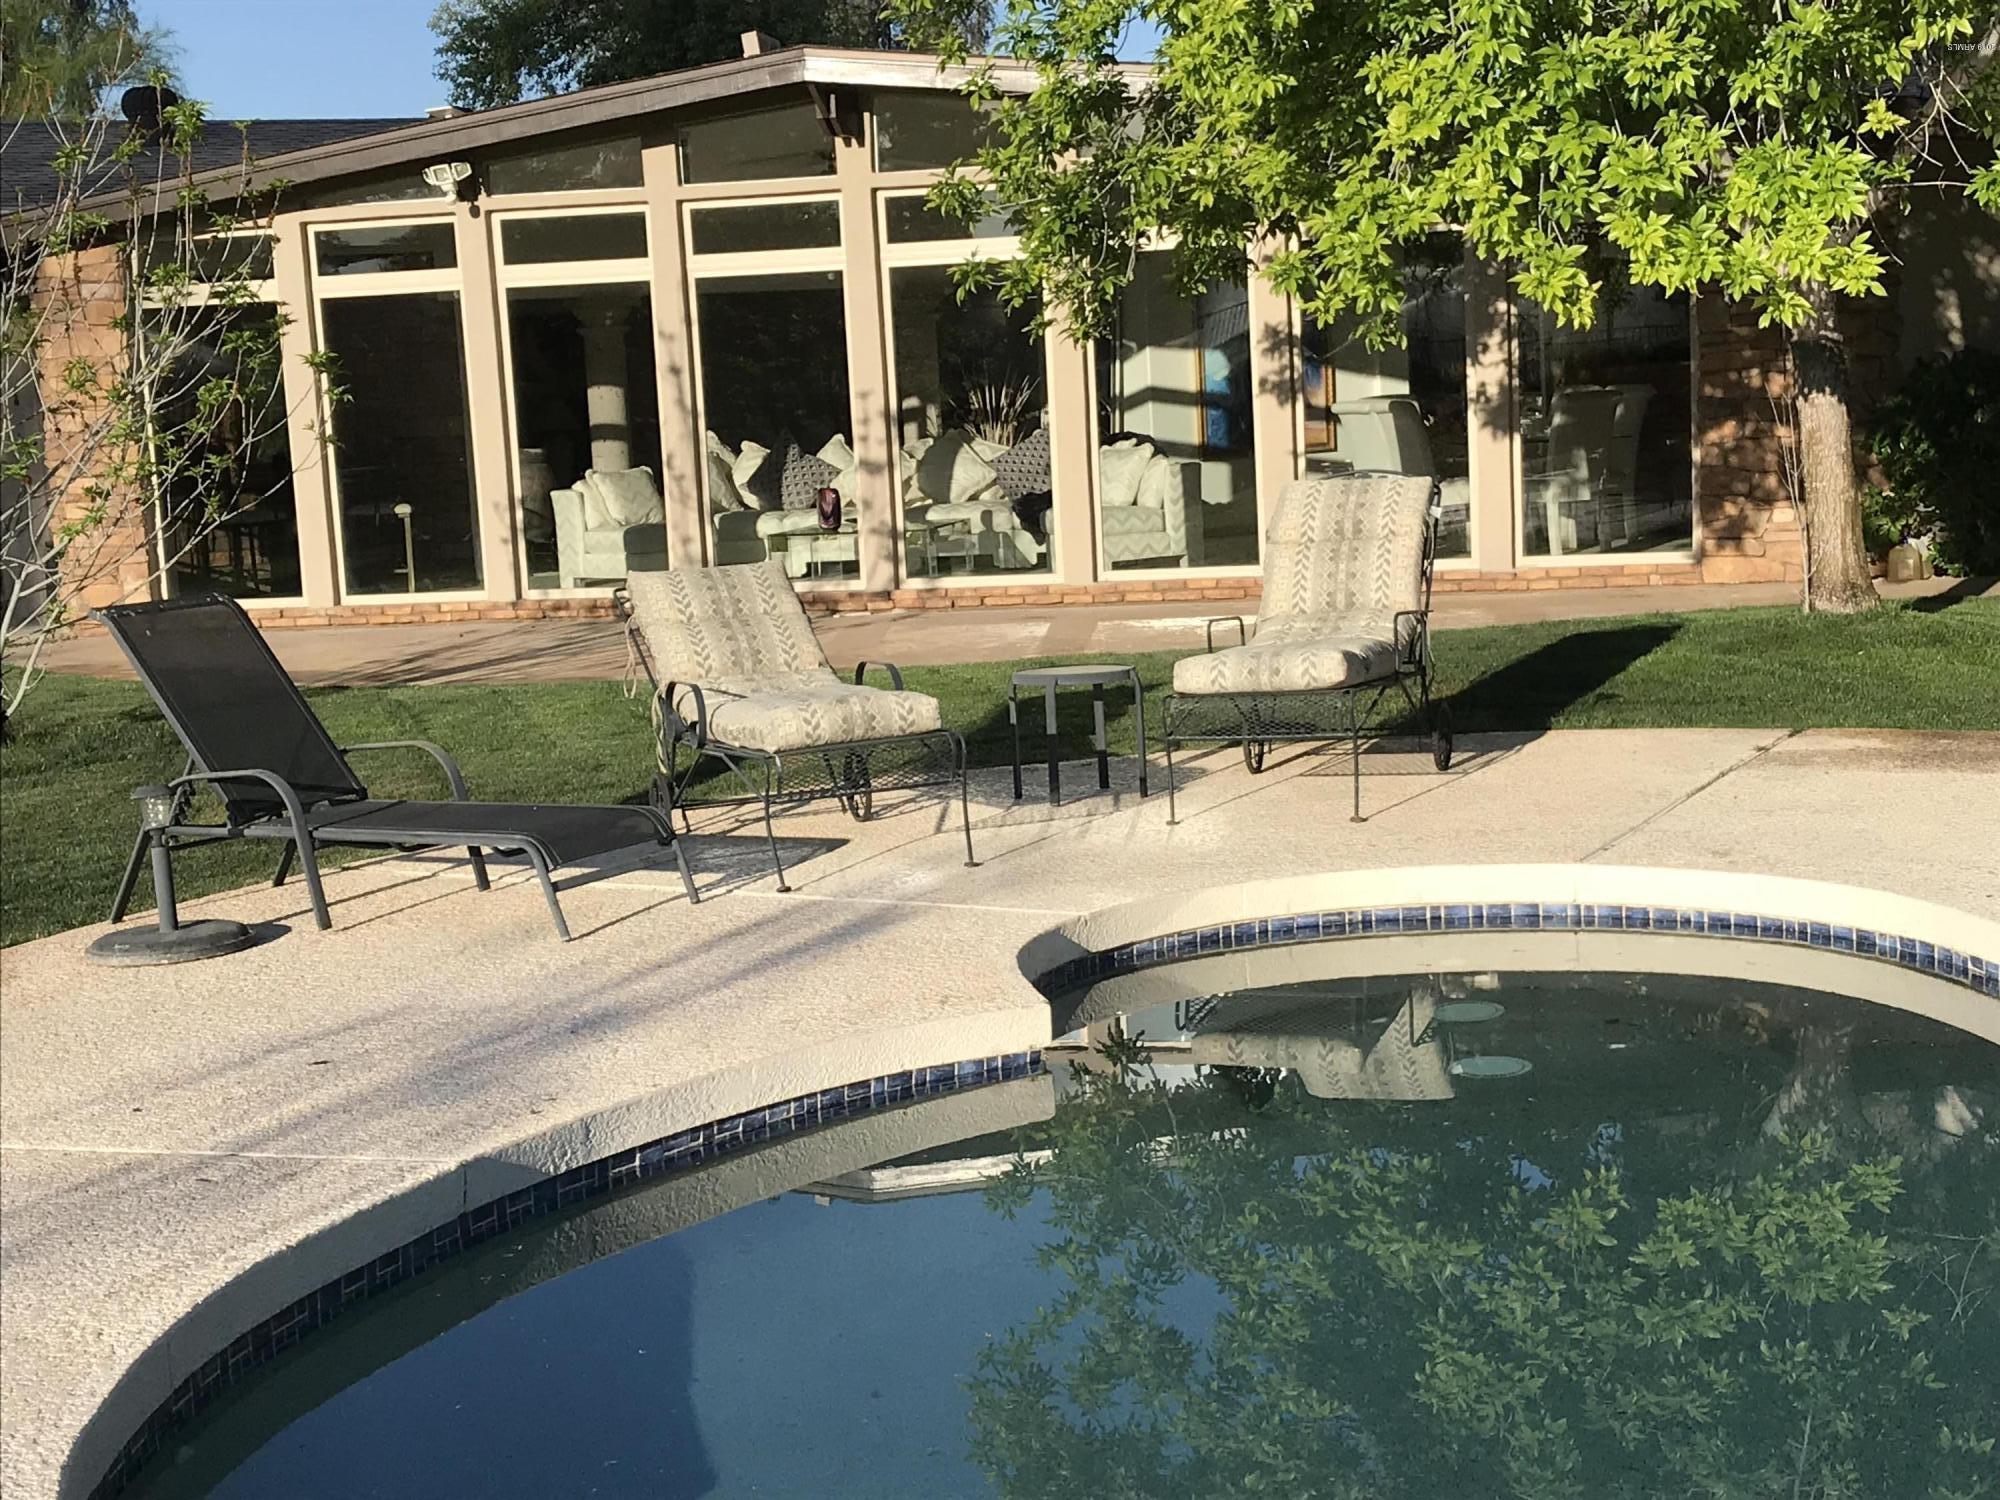 MLS 5917658 11305 N SUNDOWN Drive, Scottsdale, AZ 85260 Scottsdale AZ Private Pool